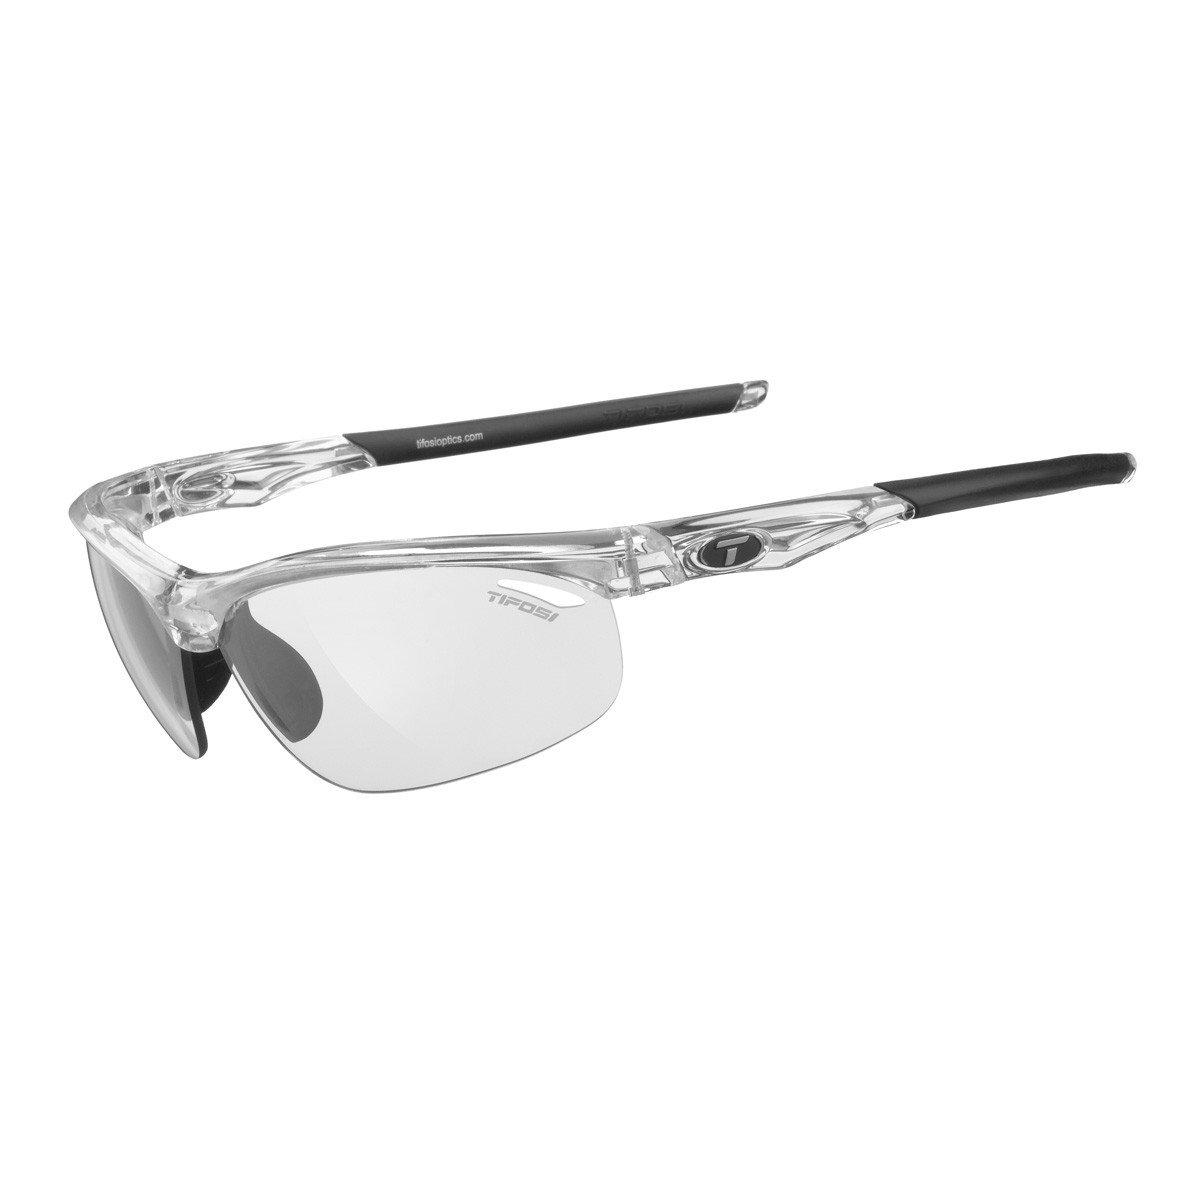 Tifosi Veloce Regular Interchangeable Wrap Sunglasses